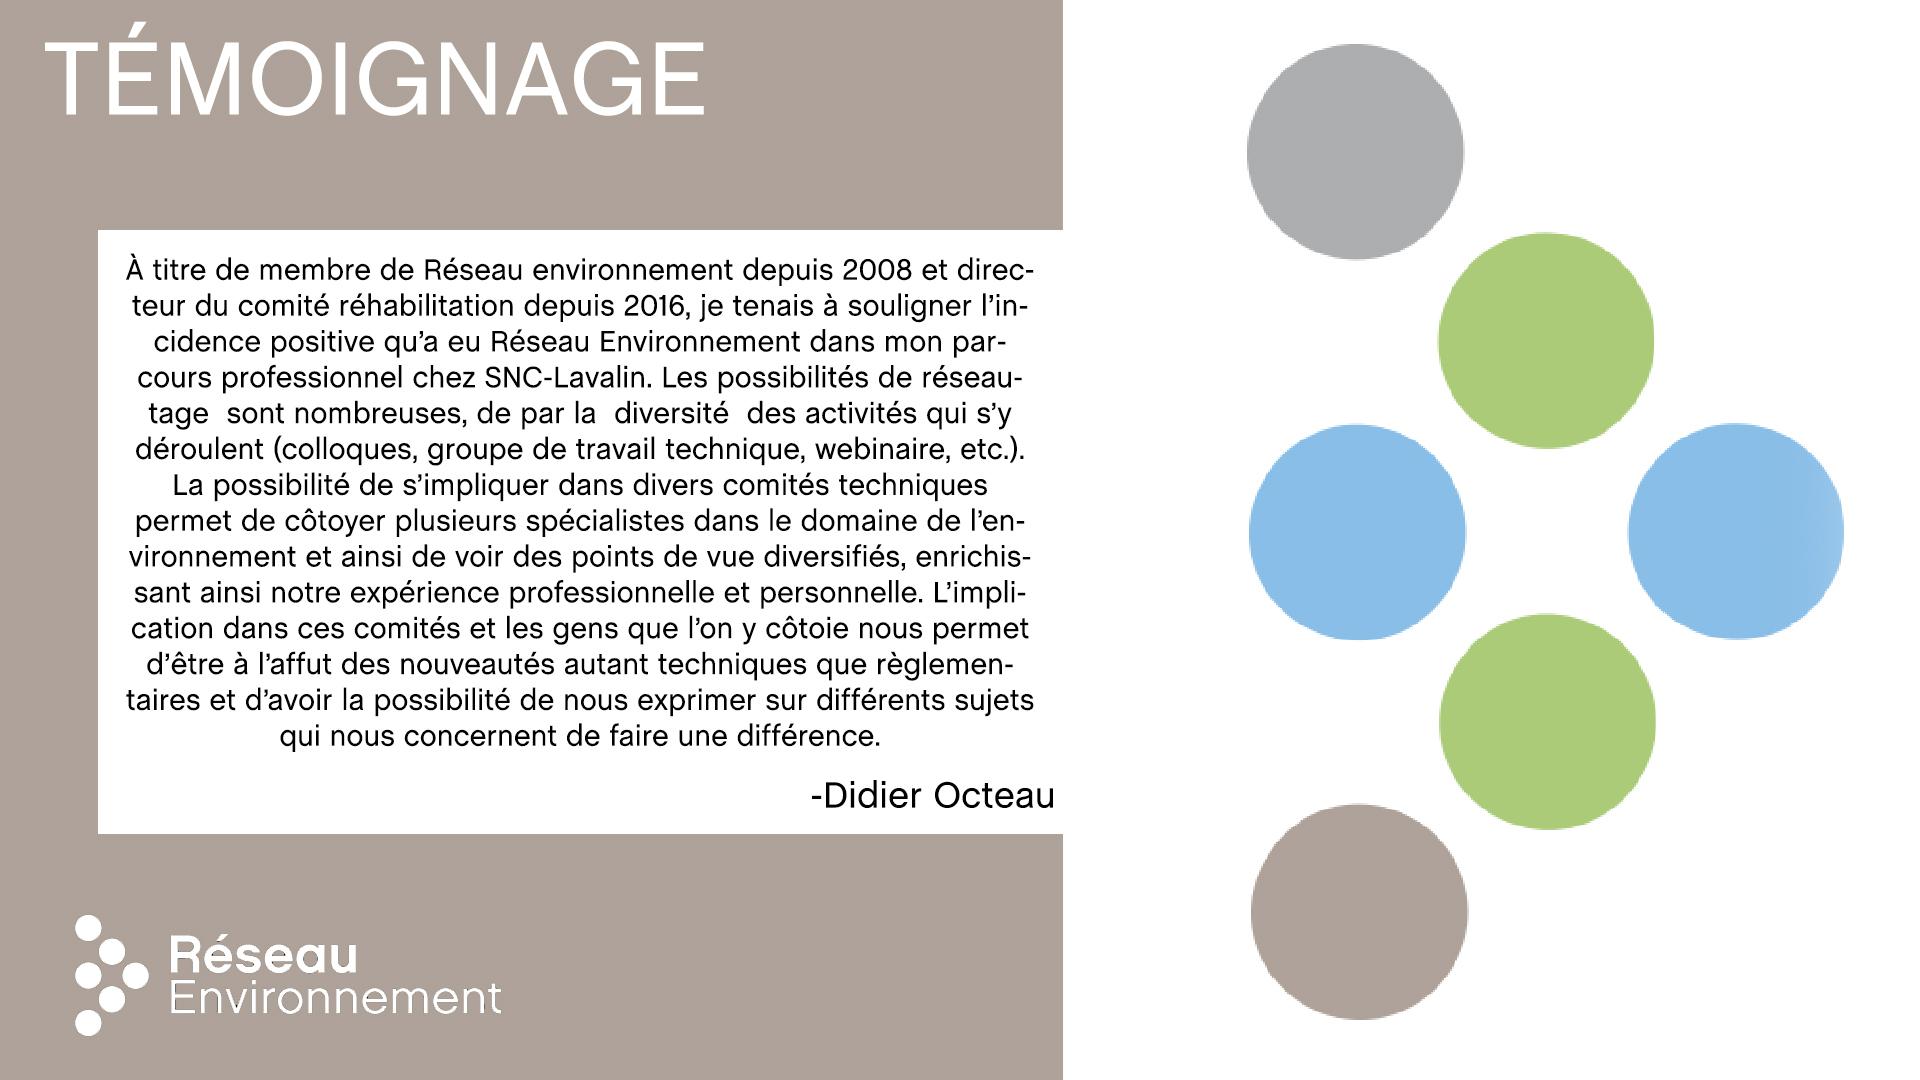 témoignage-Didier-Octeau-1